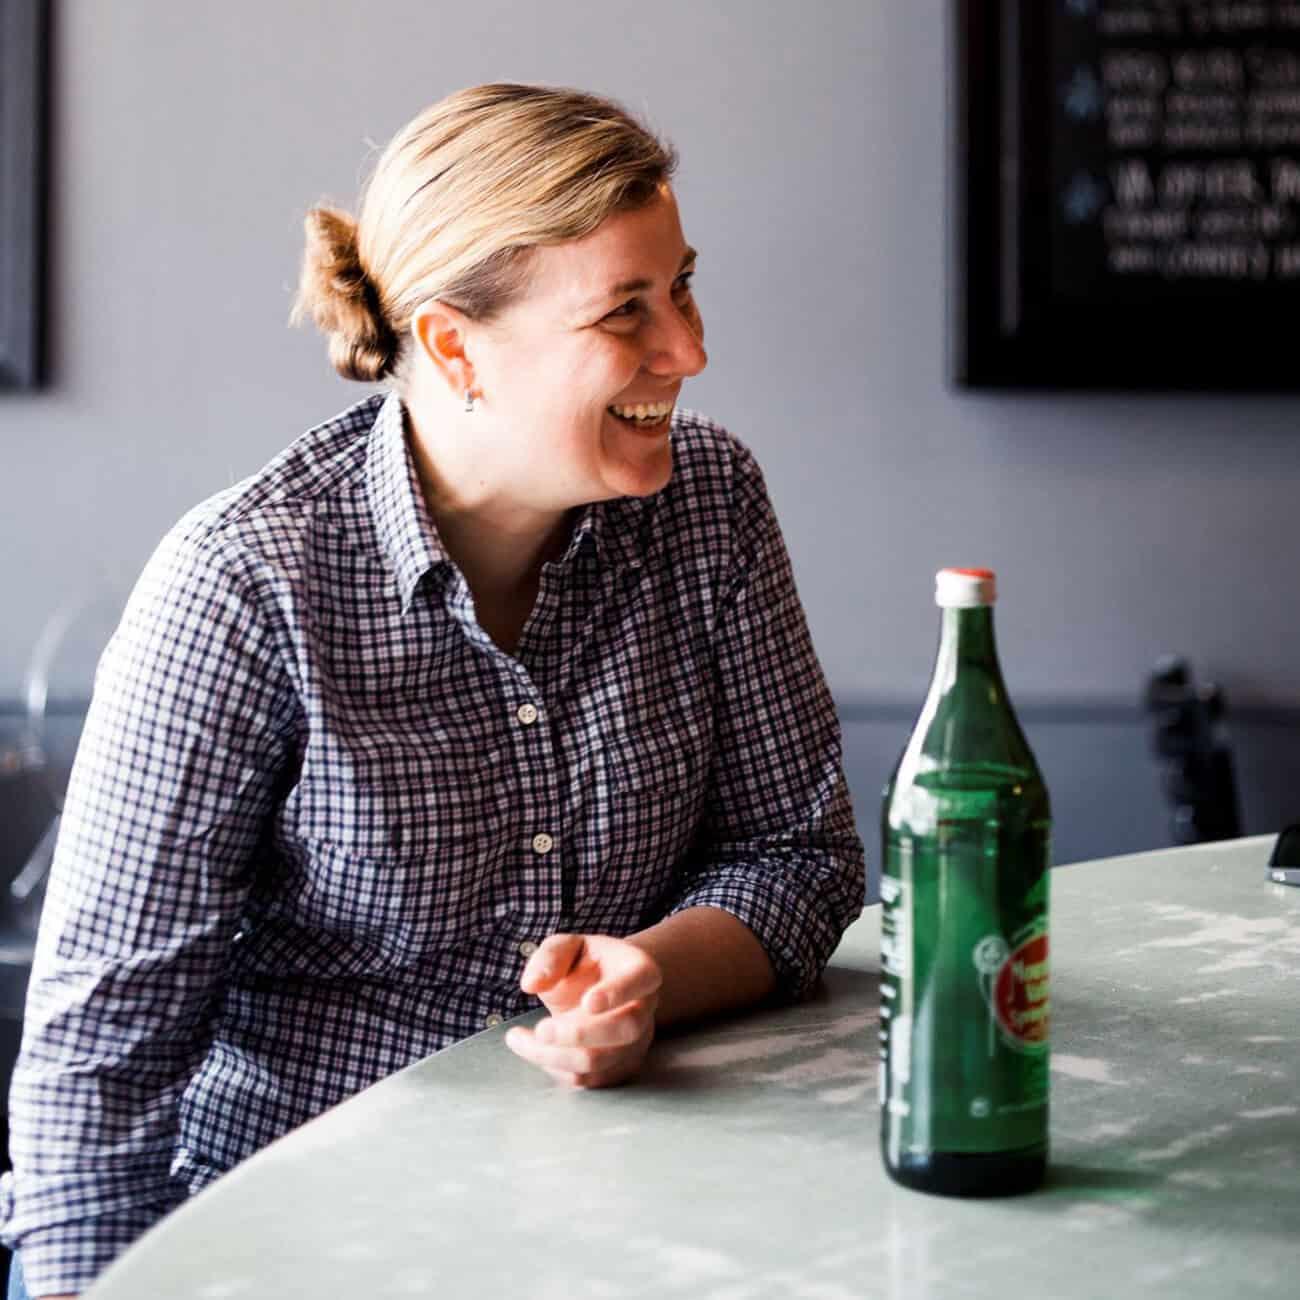 10052 MMDIGIT 1300x1300 AC headshot - TasteMaker's Dinner Honoring Chef Ashley Christensen